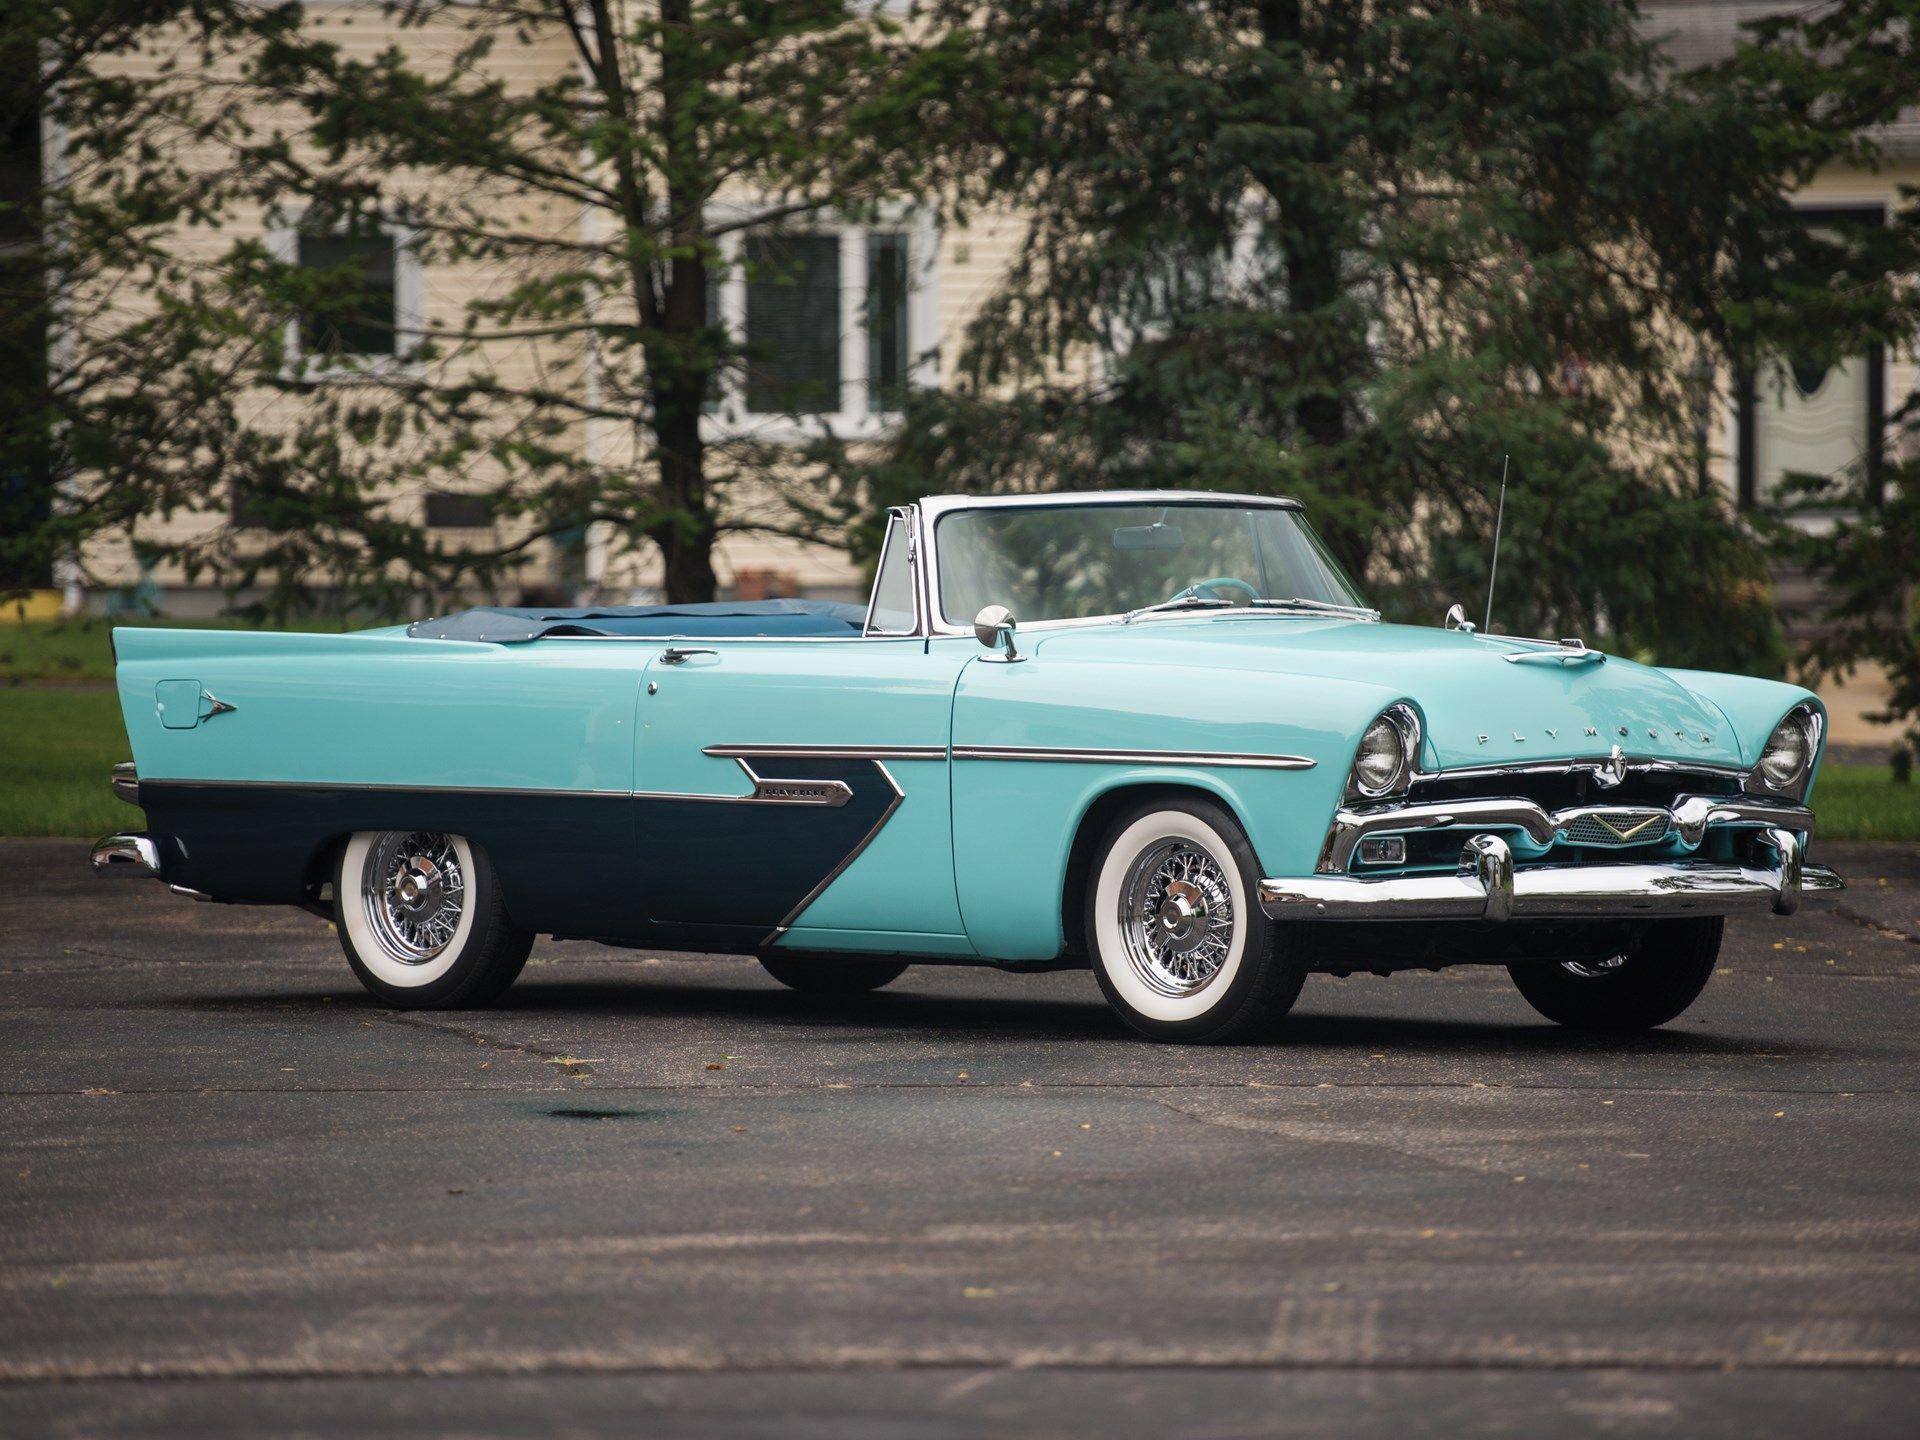 1956 Plymouth Belvedere Convertible